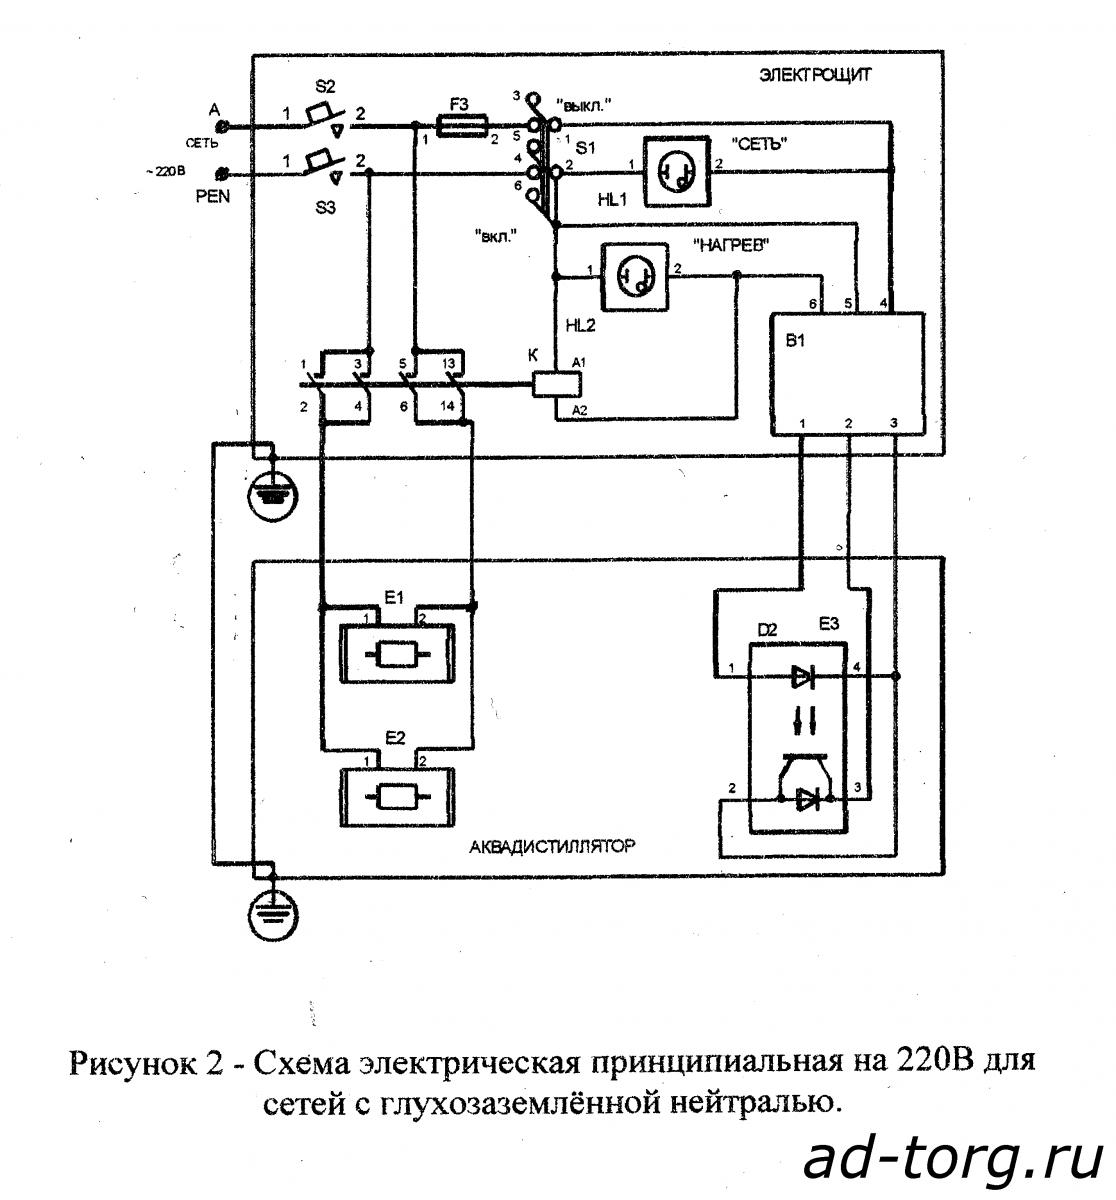 Аквадистиллятор ДЭ-4 (Тюмень) Купить дистиллятор Аквадистиллятор дэ-4 схема соединения